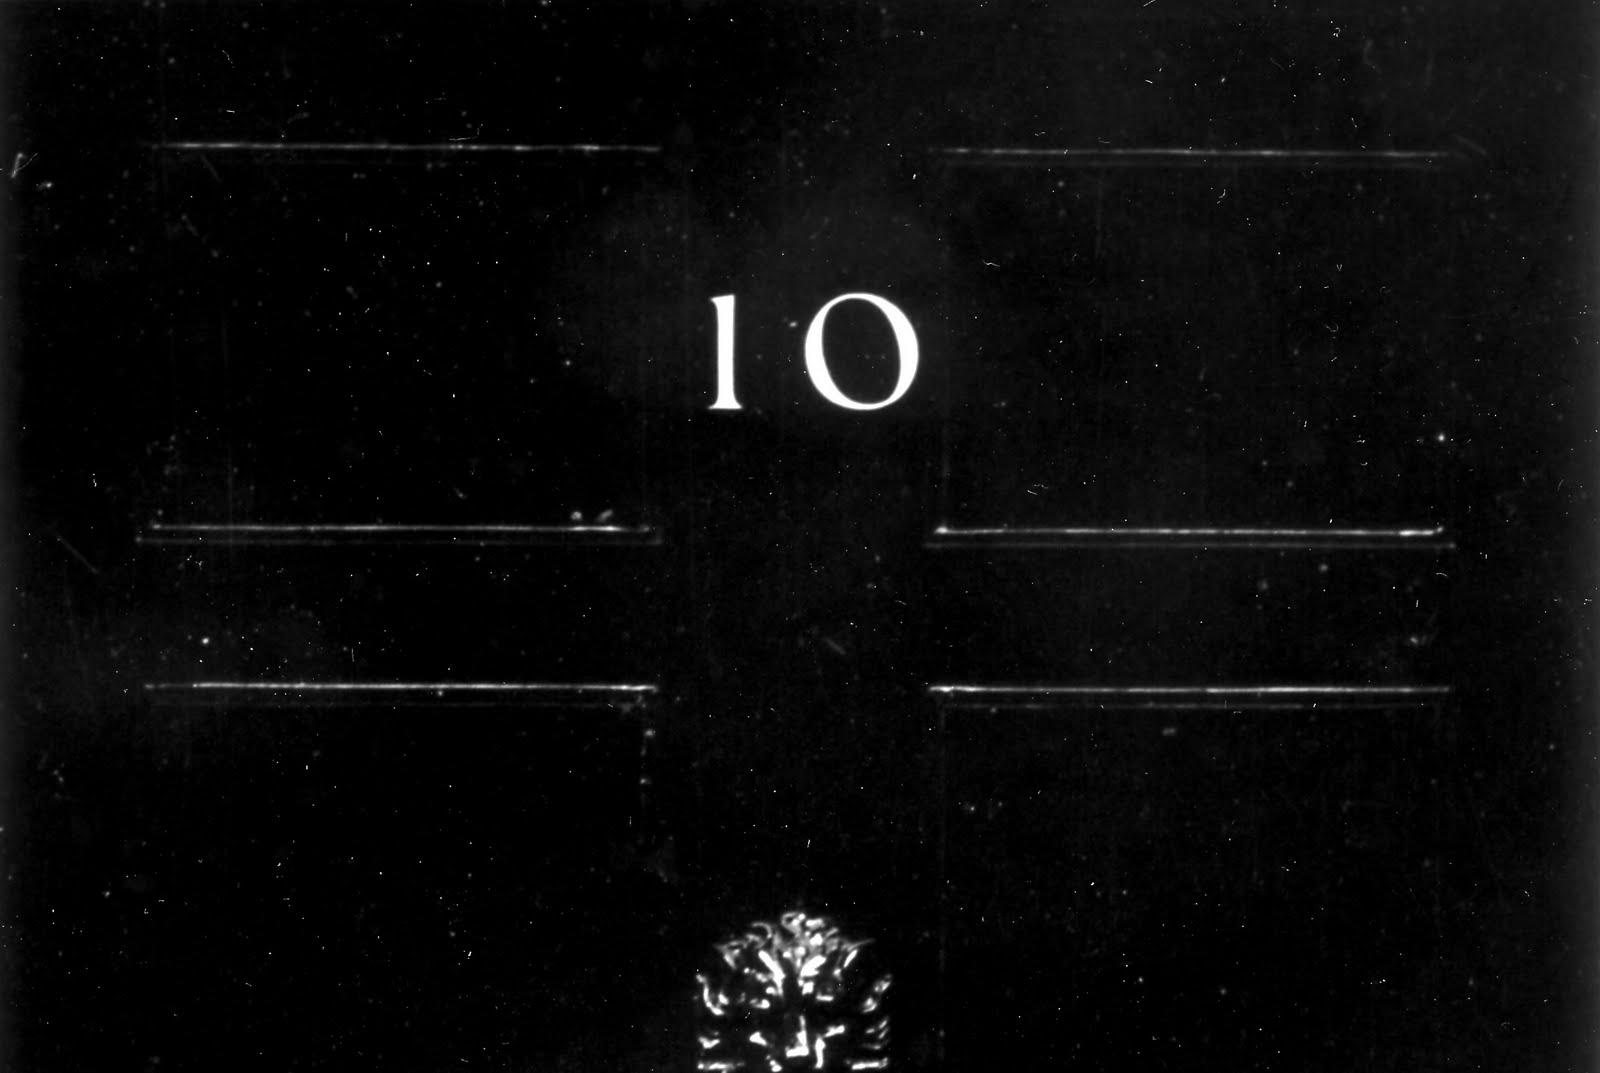 sc 1 st  Typefoundry & Typefoundry: Number Ten